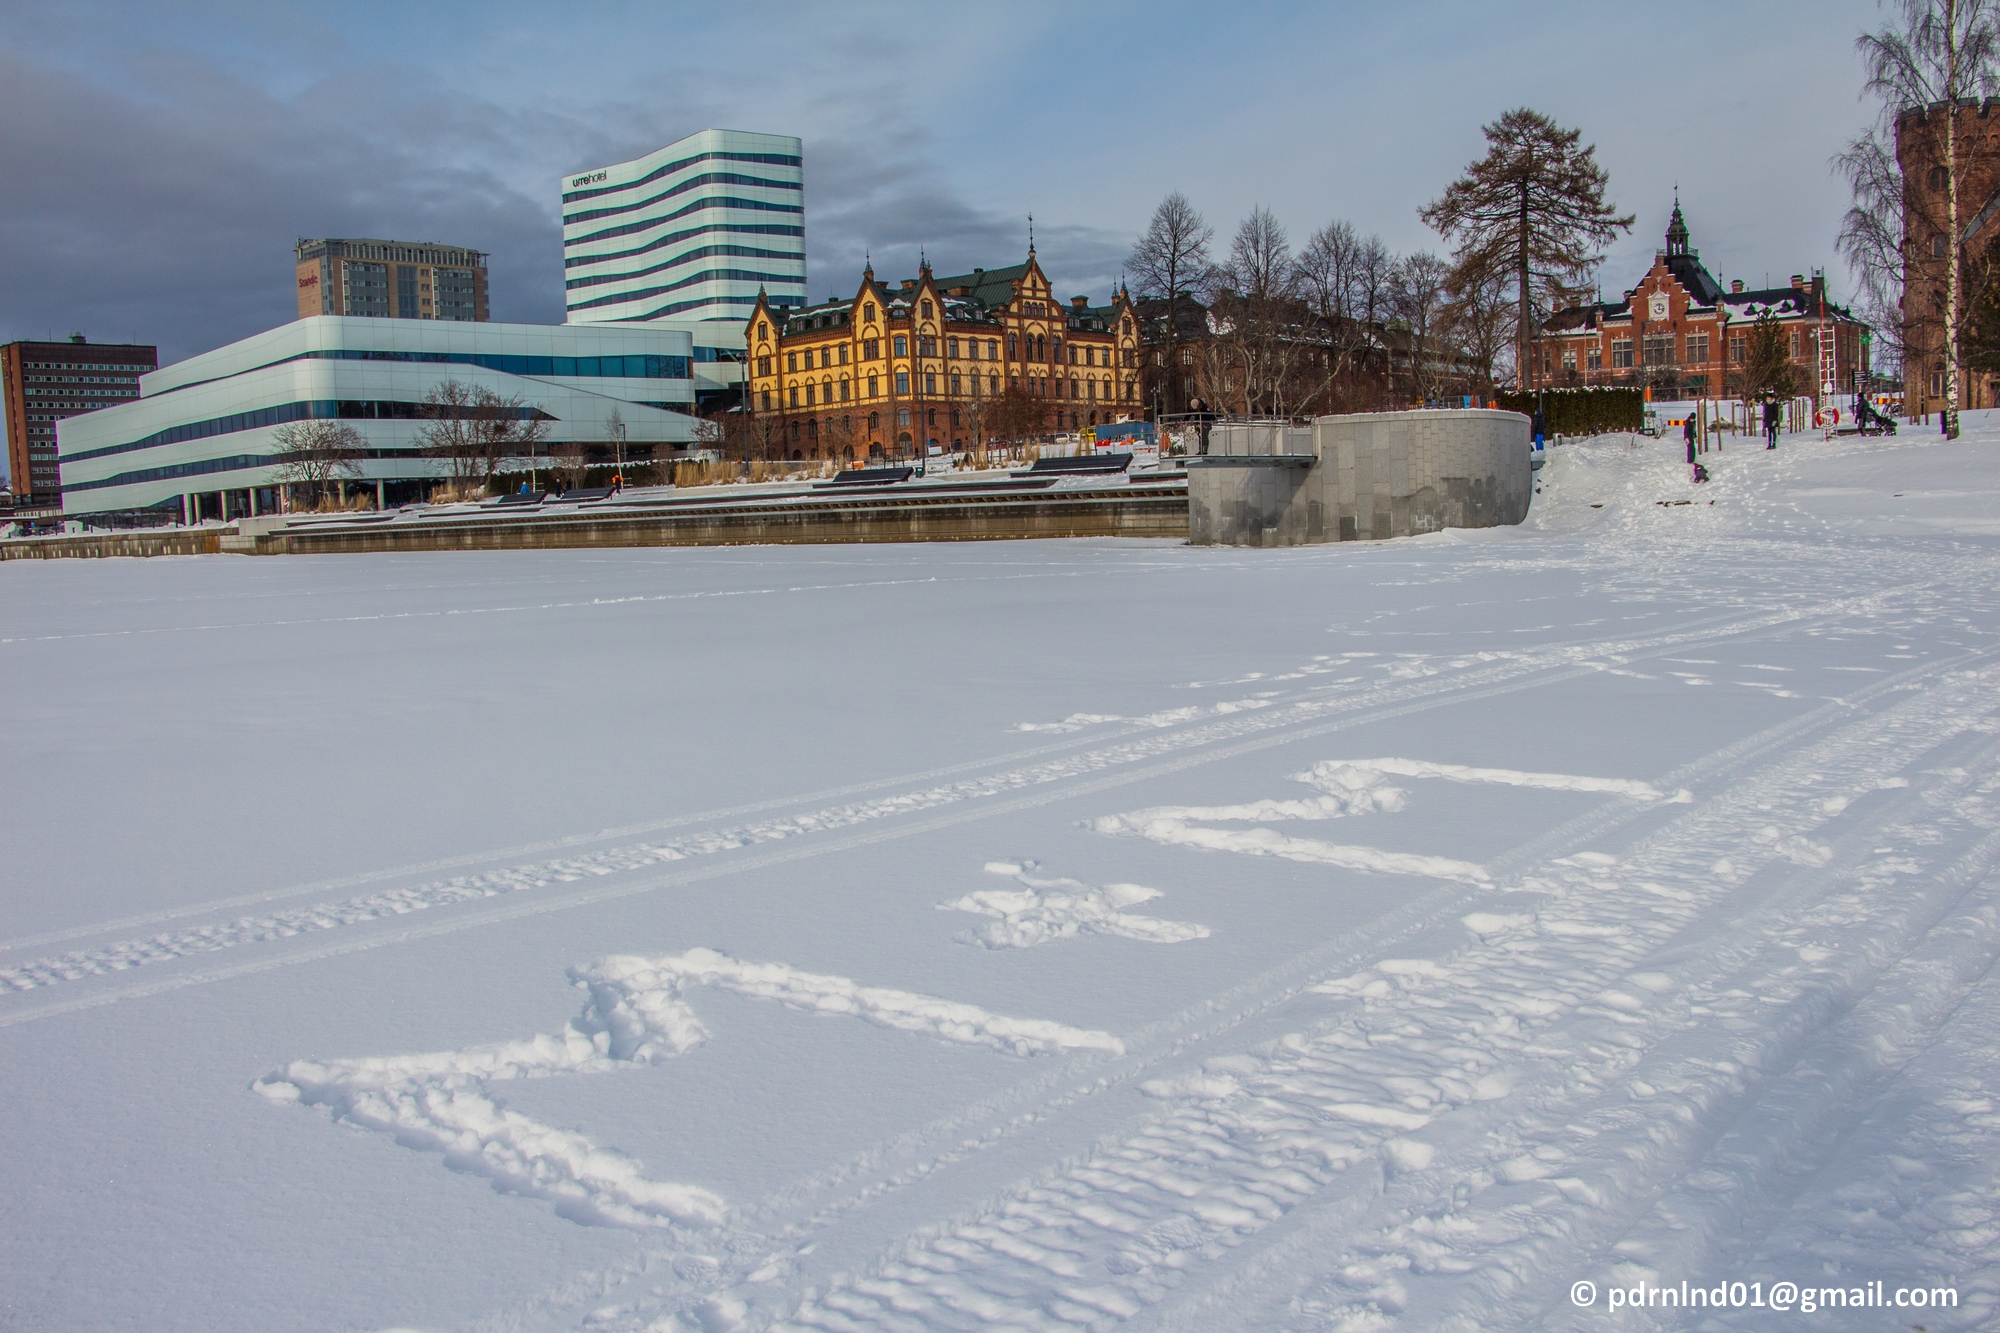 2016-02-27 Umeå 019-1